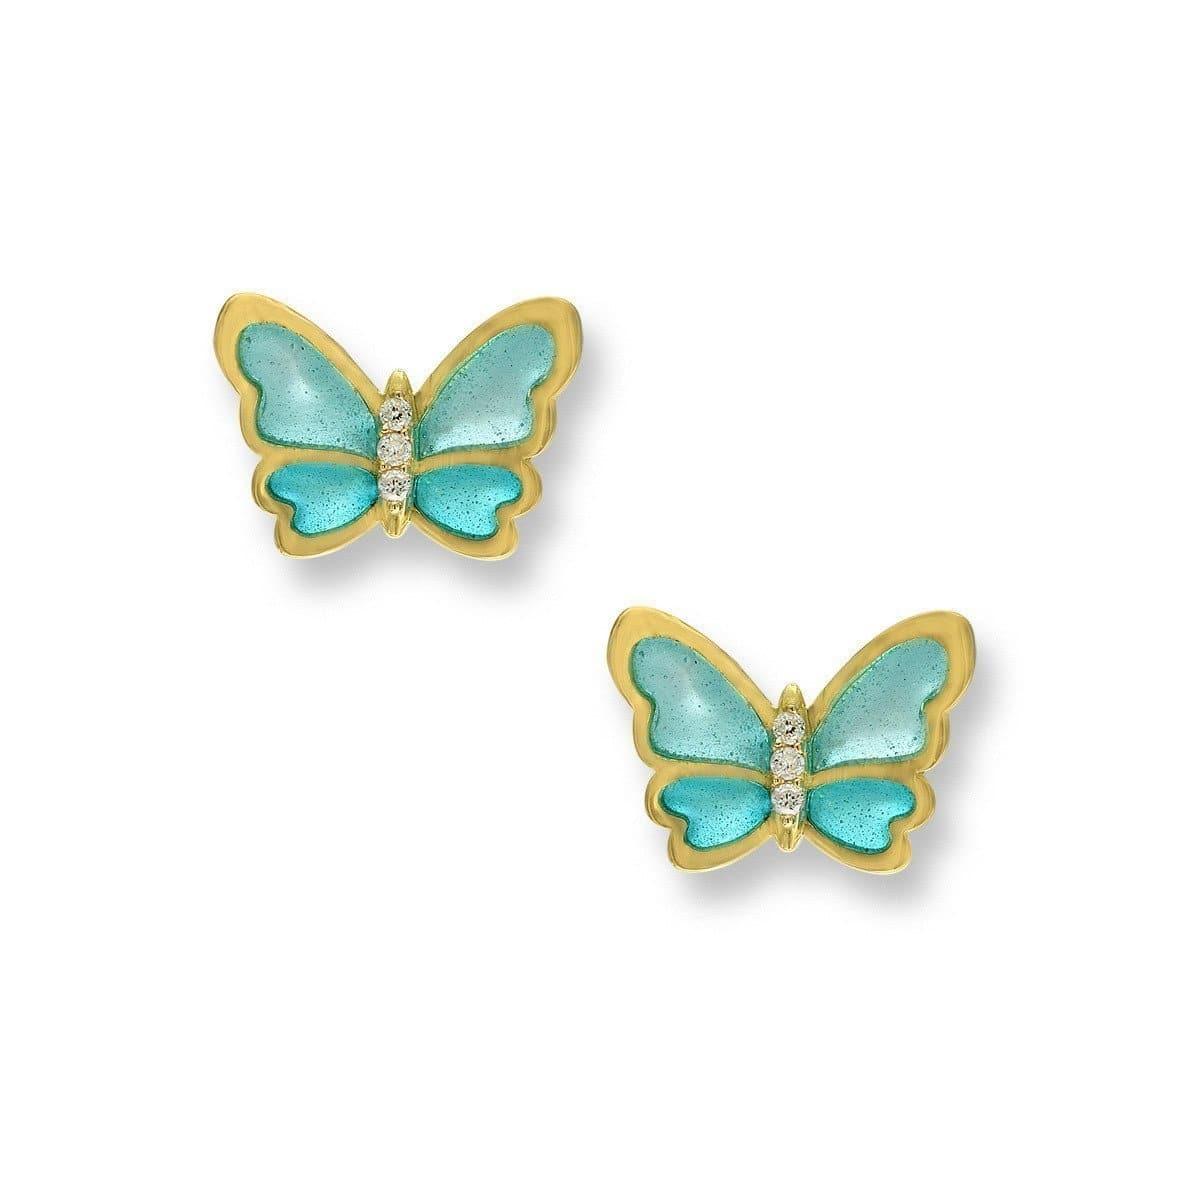 18kt Gold Butterfly Turquoise Stud Earrings